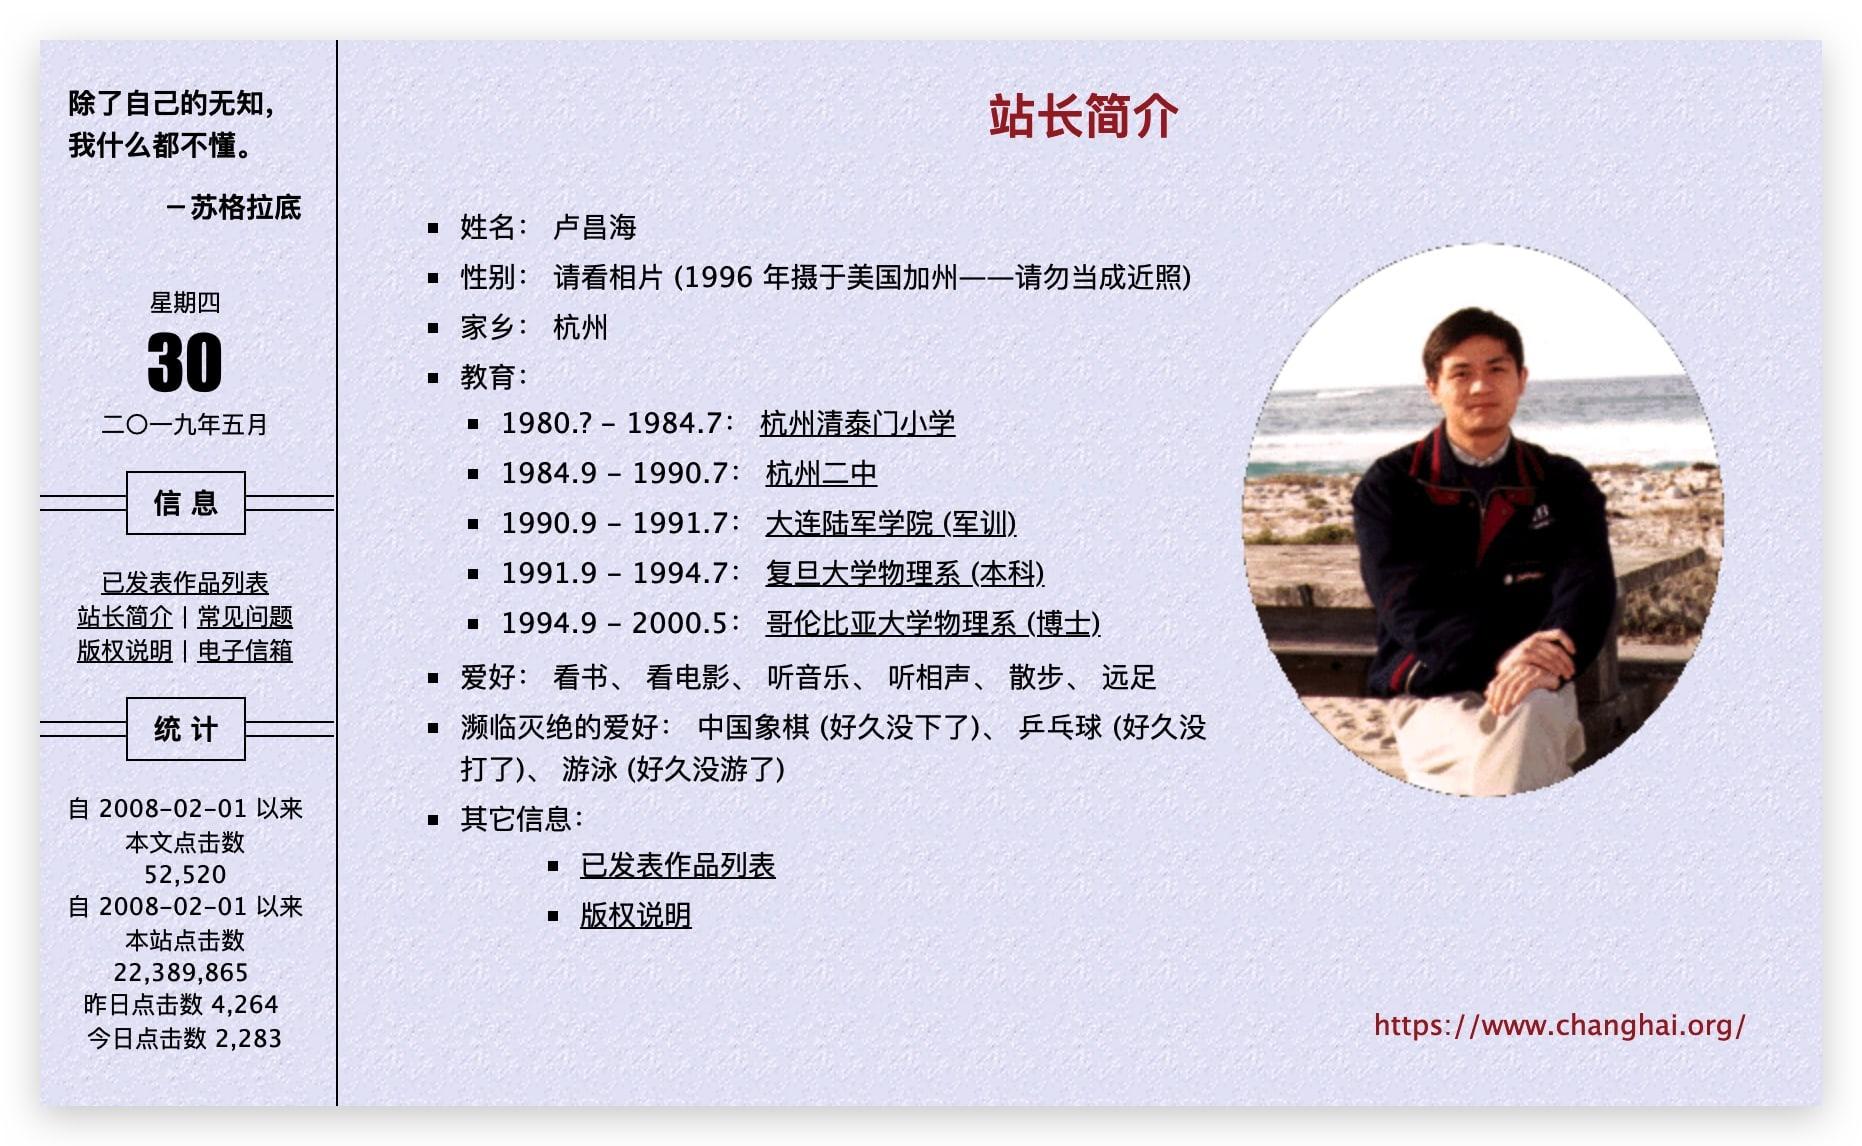 Xnip2019-05-30_01-20-07.jpg-317.2kB